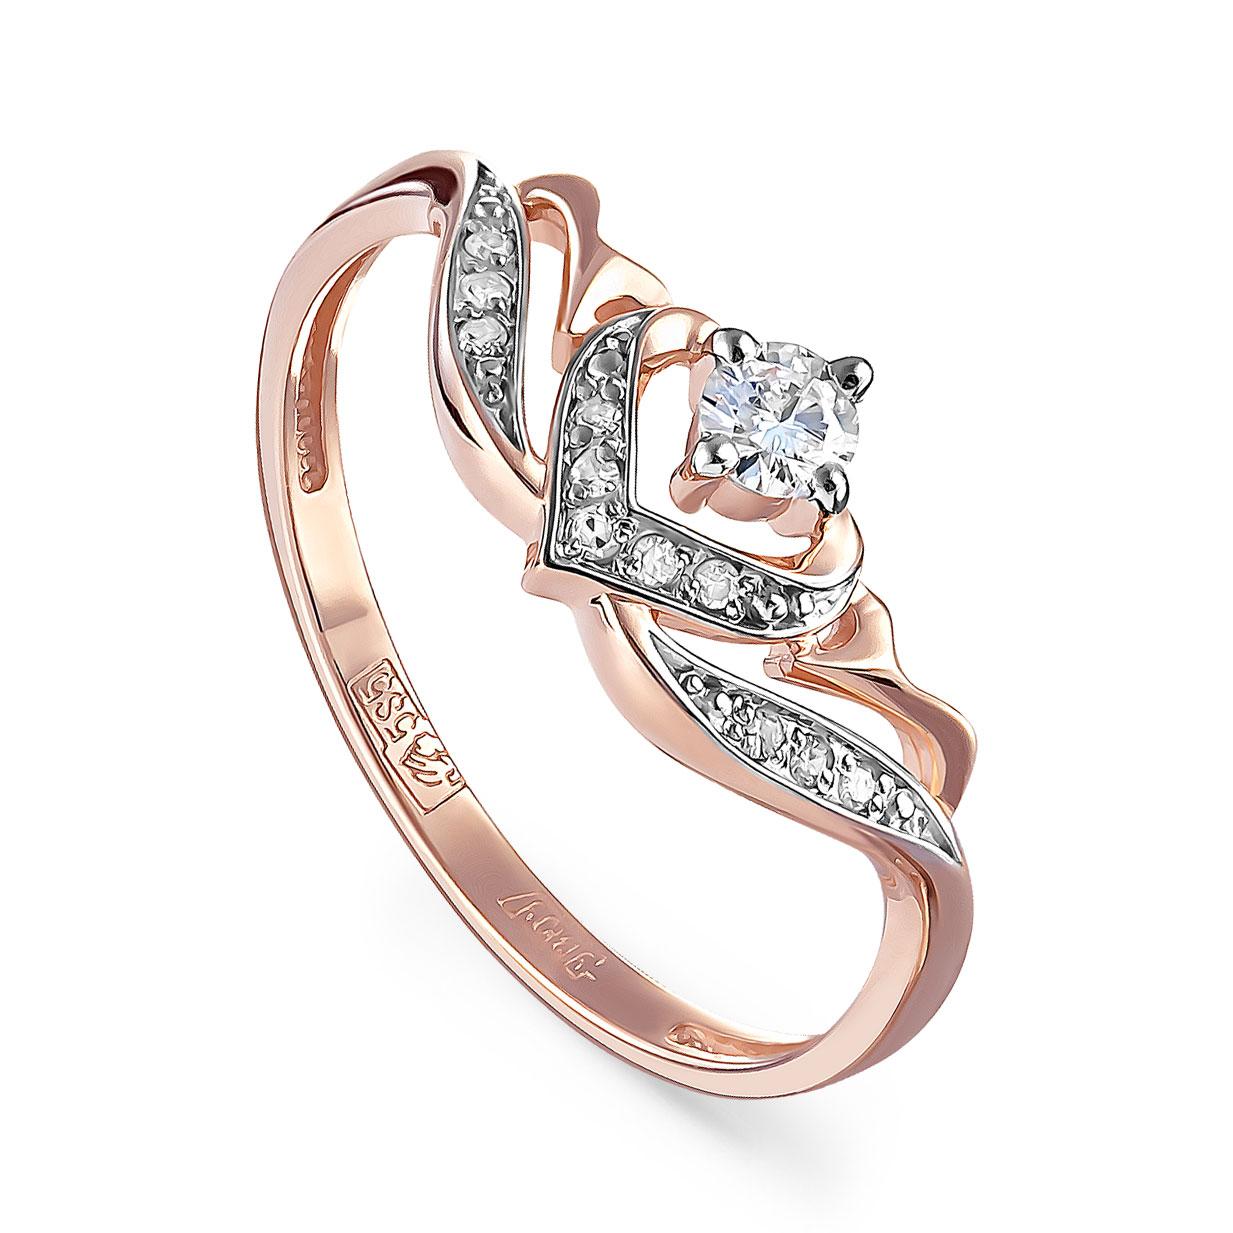 Золотое кольцо Бриллиант арт. 11-01211-1000 11-01211-1000